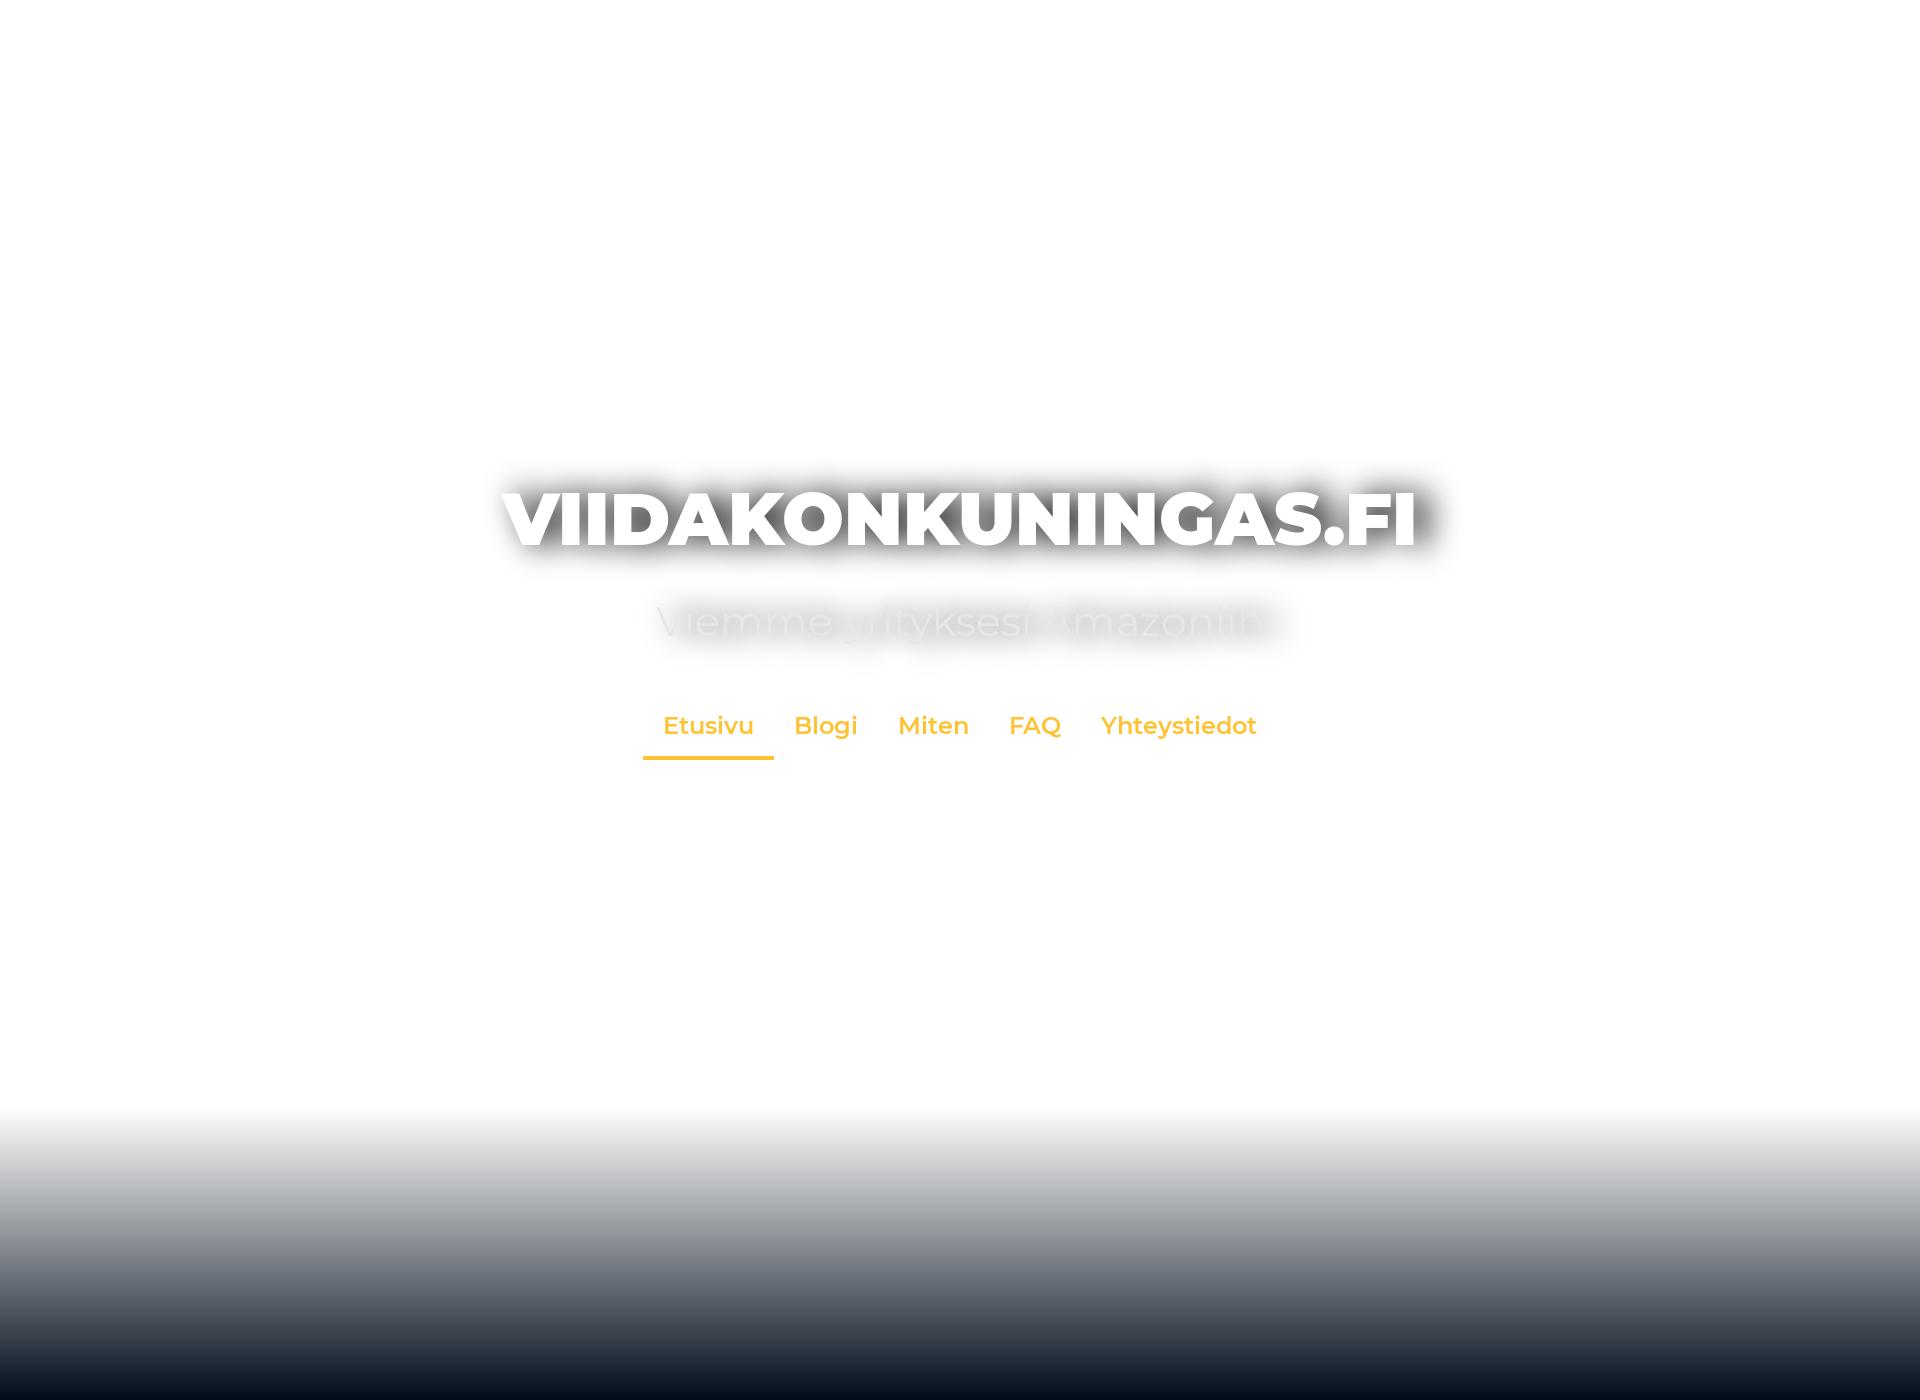 Screenshot for viidakonkuningas.fi